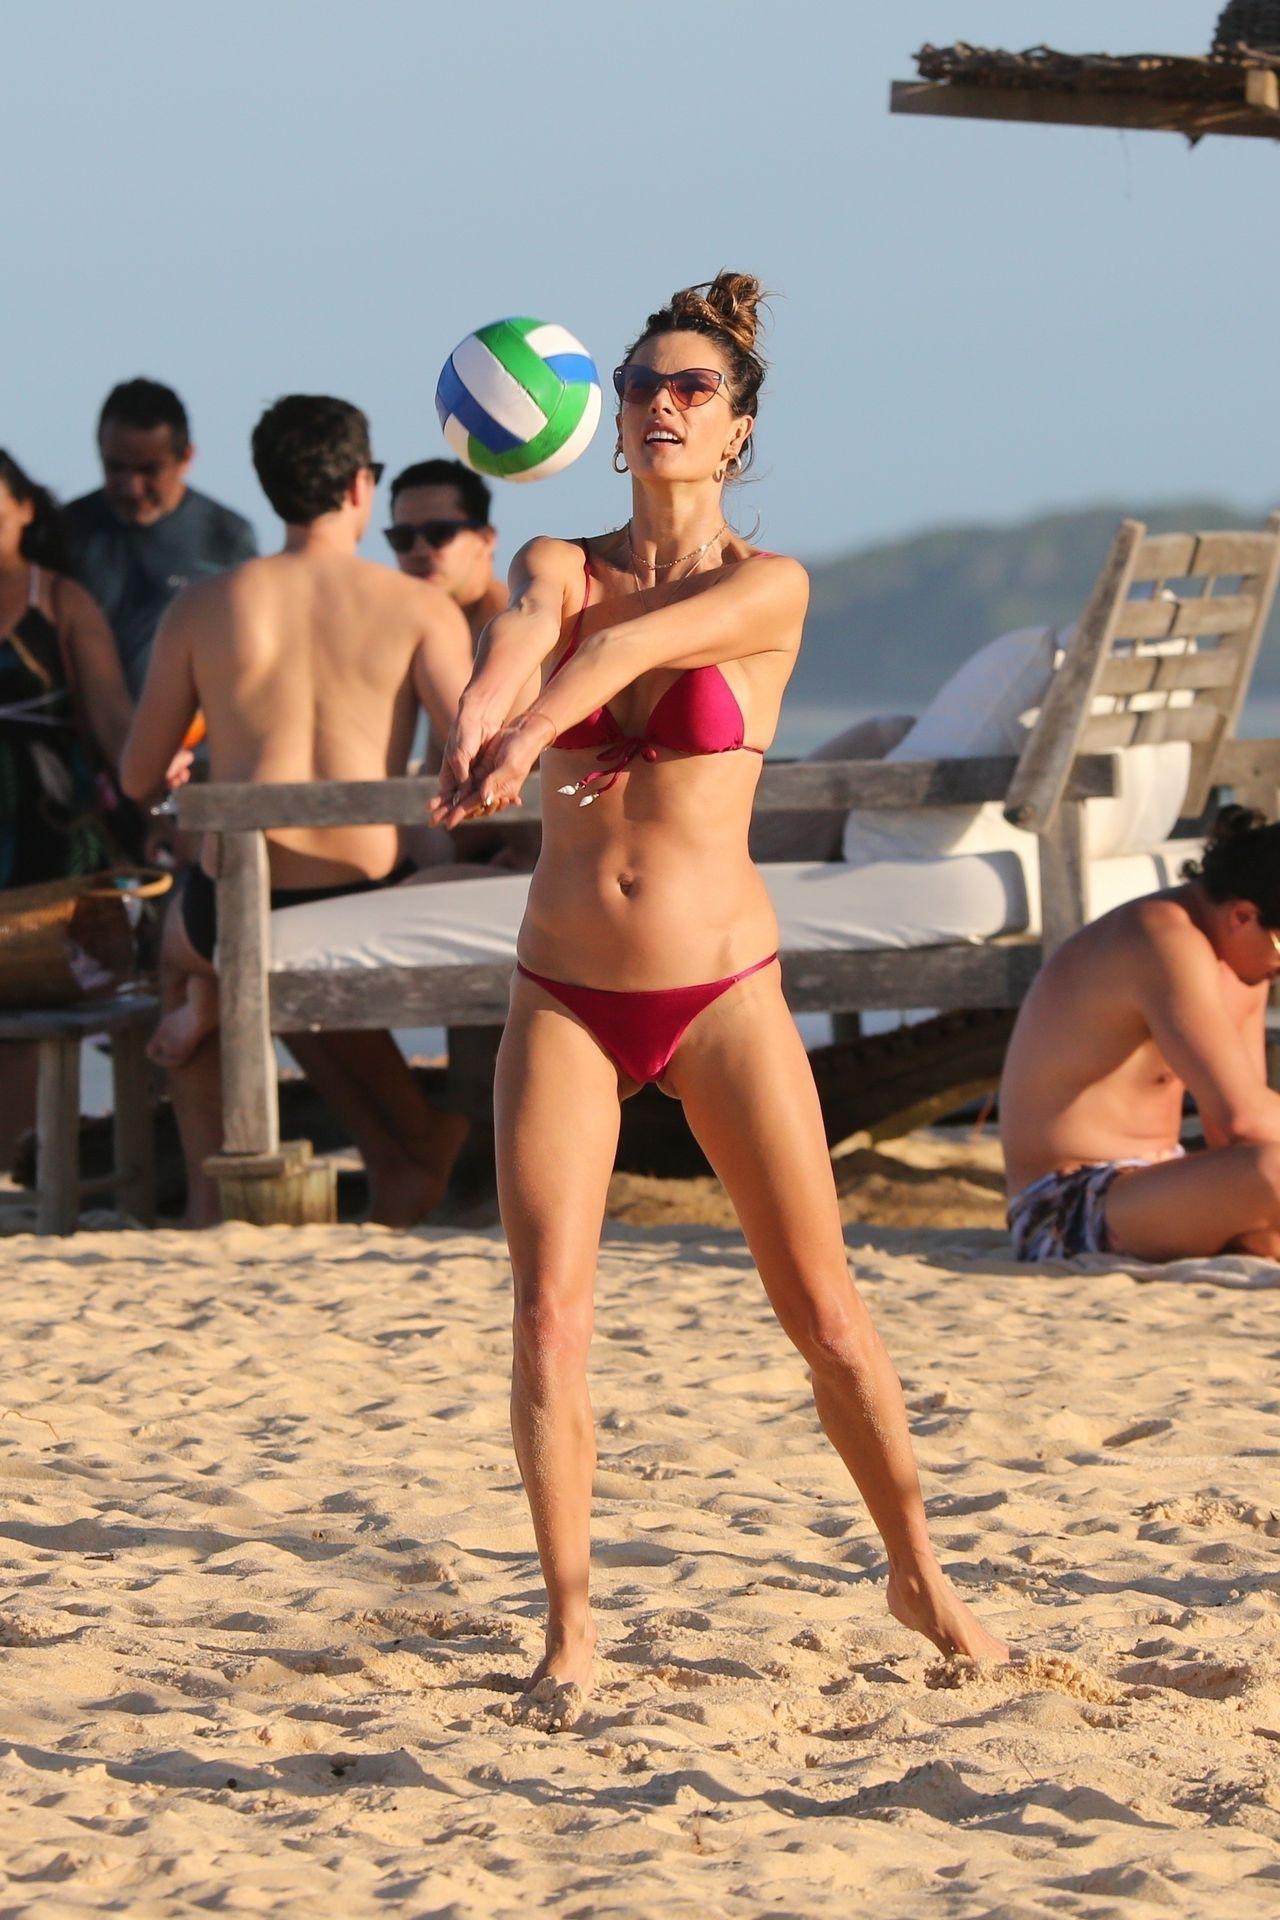 Alessandra-Ambrosio-Sexy-47-thefappeningblog.com_-1.jpg